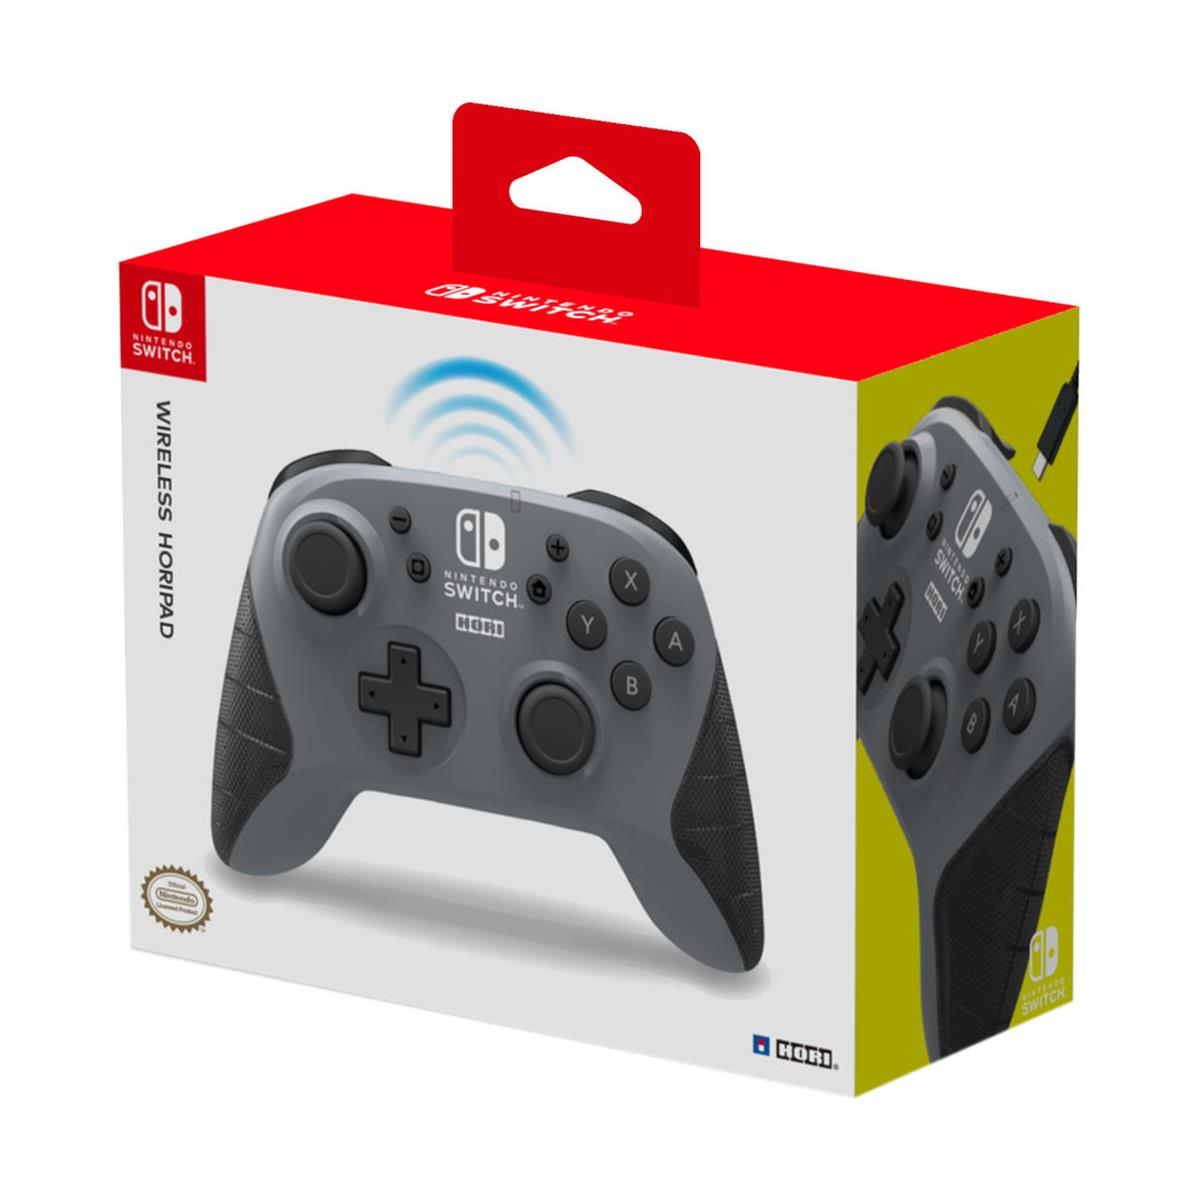 Nintendo Switch Mando Hori Wireless Gris